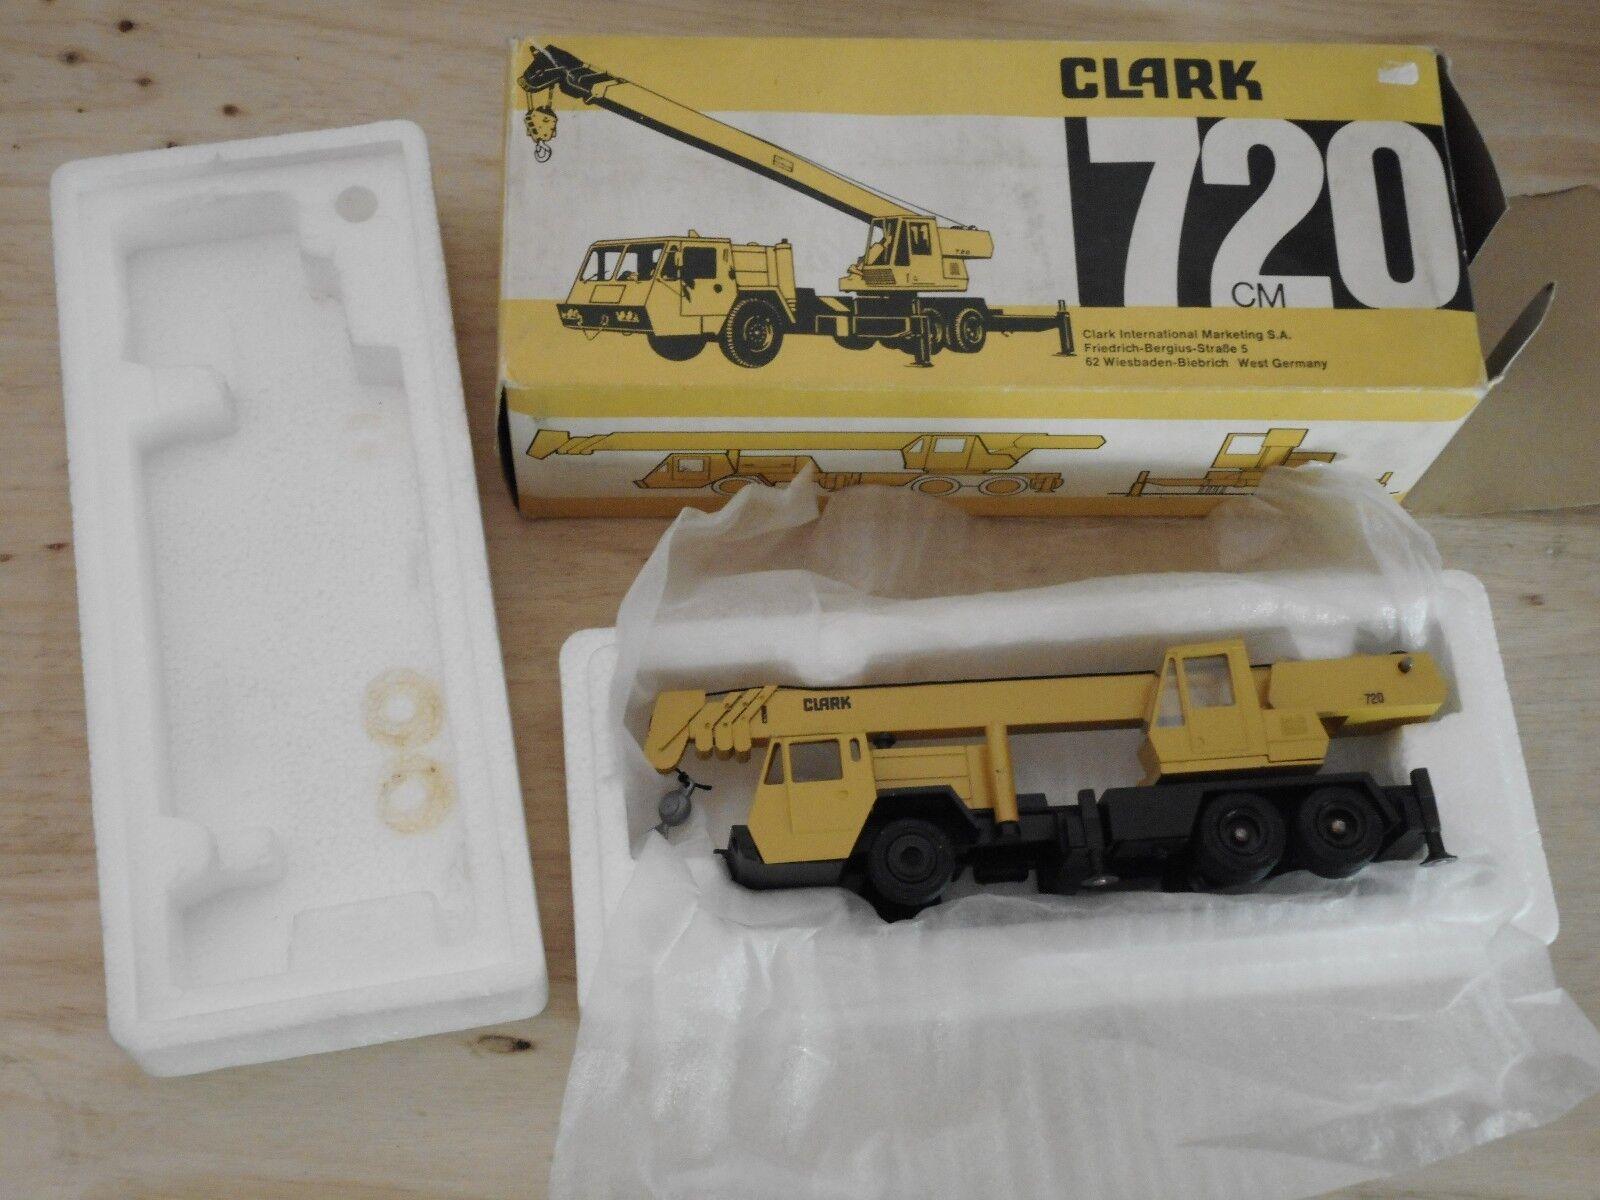 GESCHA modèle échelle 1 50 diecast -clark 720 crane+ BOITE